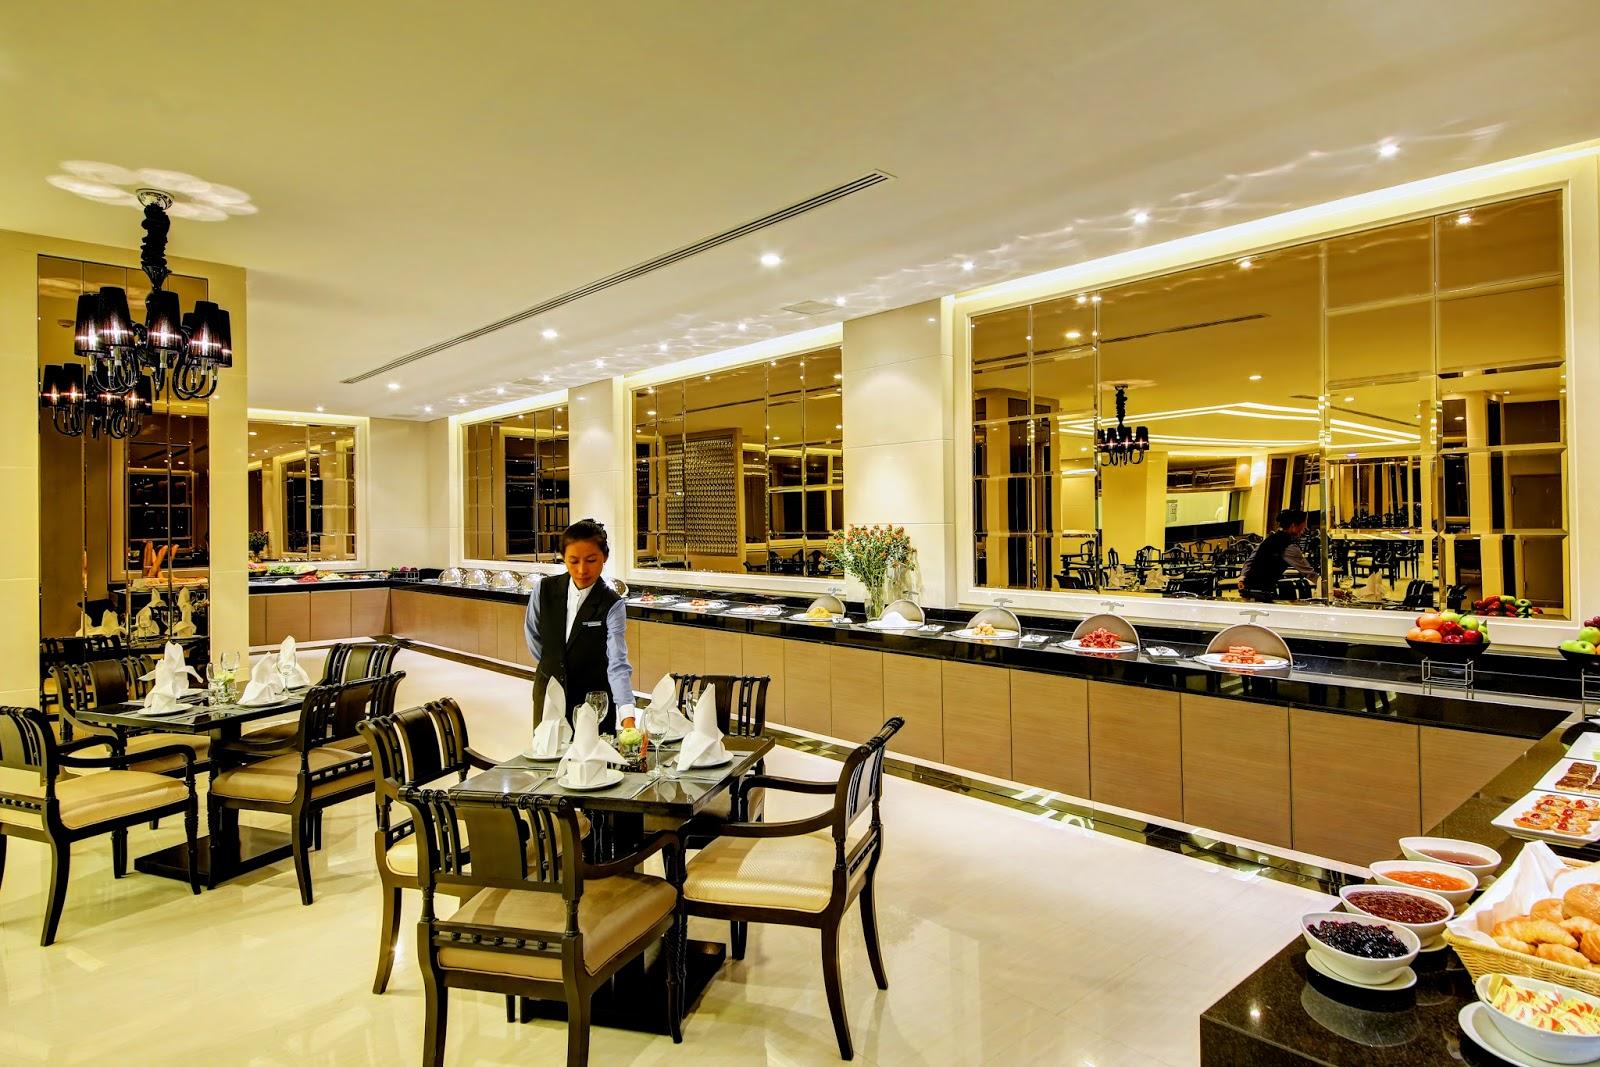 Mandarin hotel managed by centre point - Hotel mandarin restaurante ...